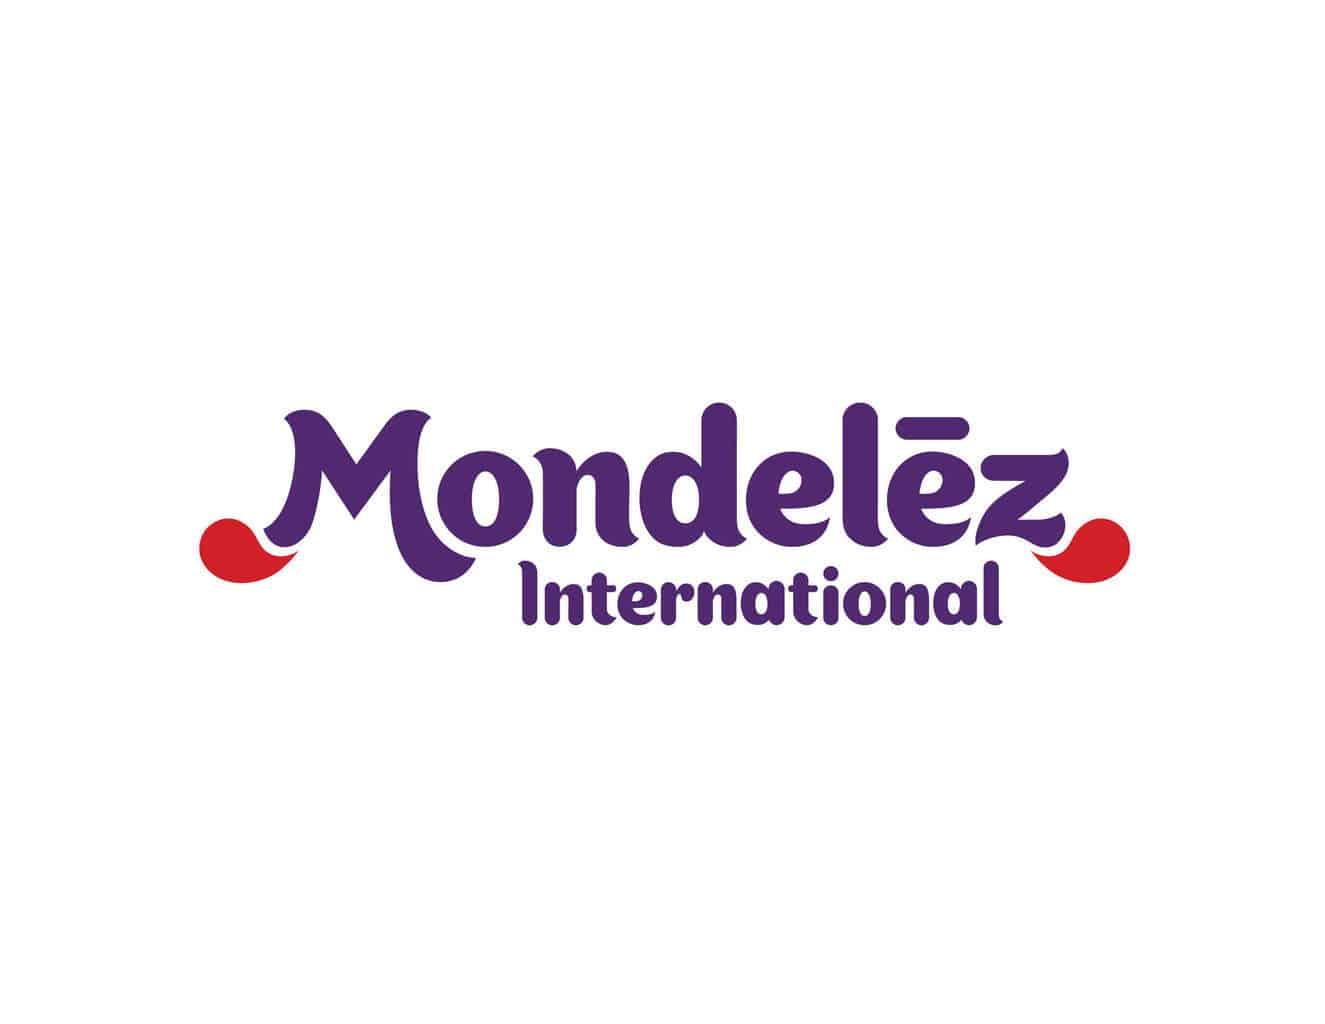 CFTC Imposes $16 Million Penalty on Kraft, Mondelez